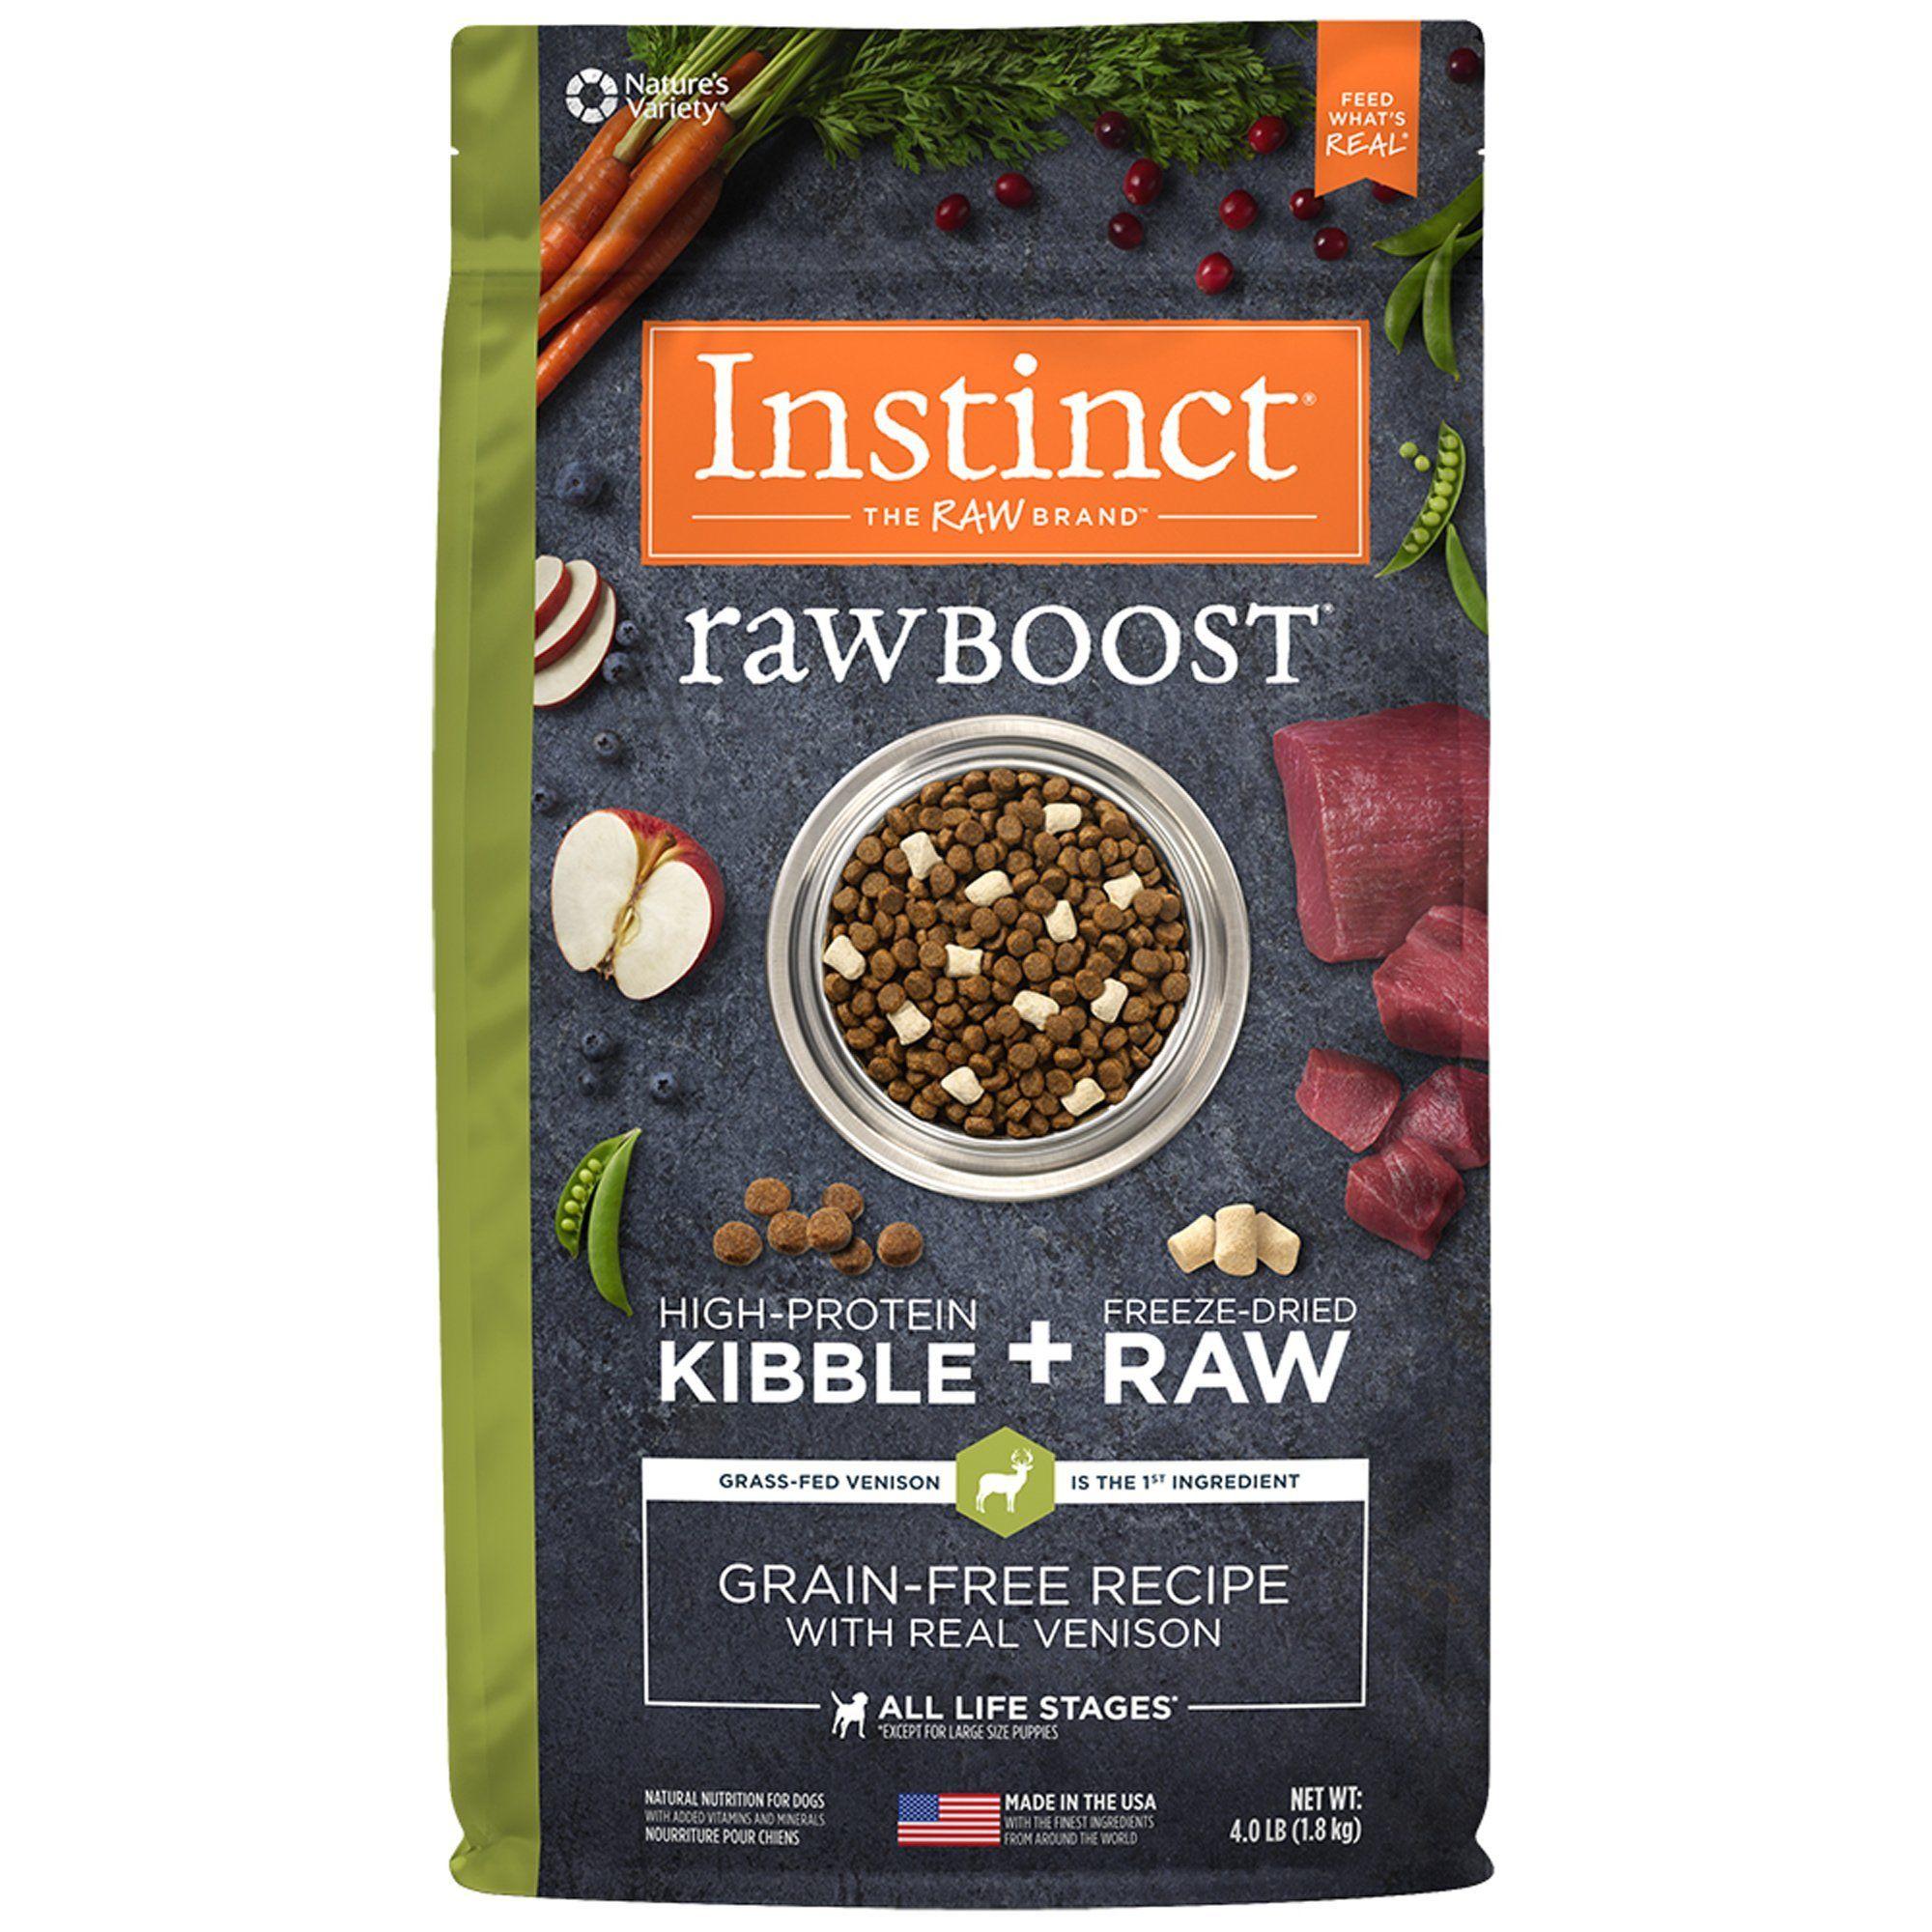 Instinct Raw Boost Grain Free Recipe with Real Venison